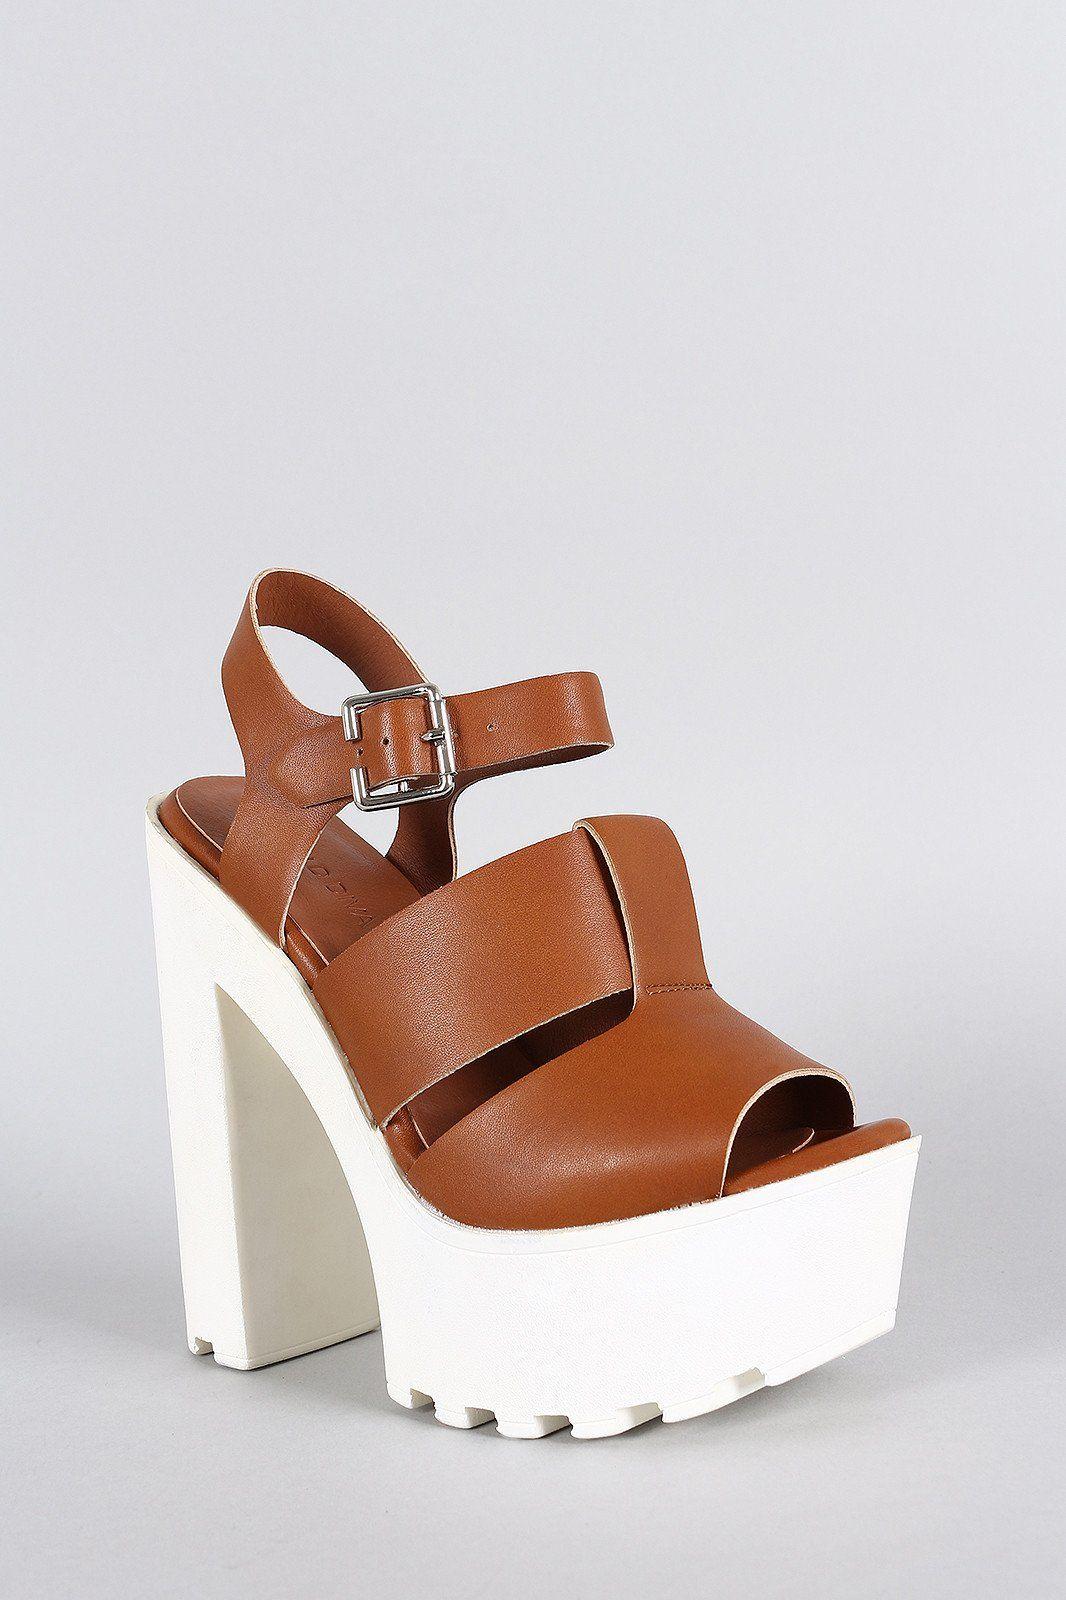 9abe6718ff1 Wild Diva Lounge Lug Sole Platform Heel